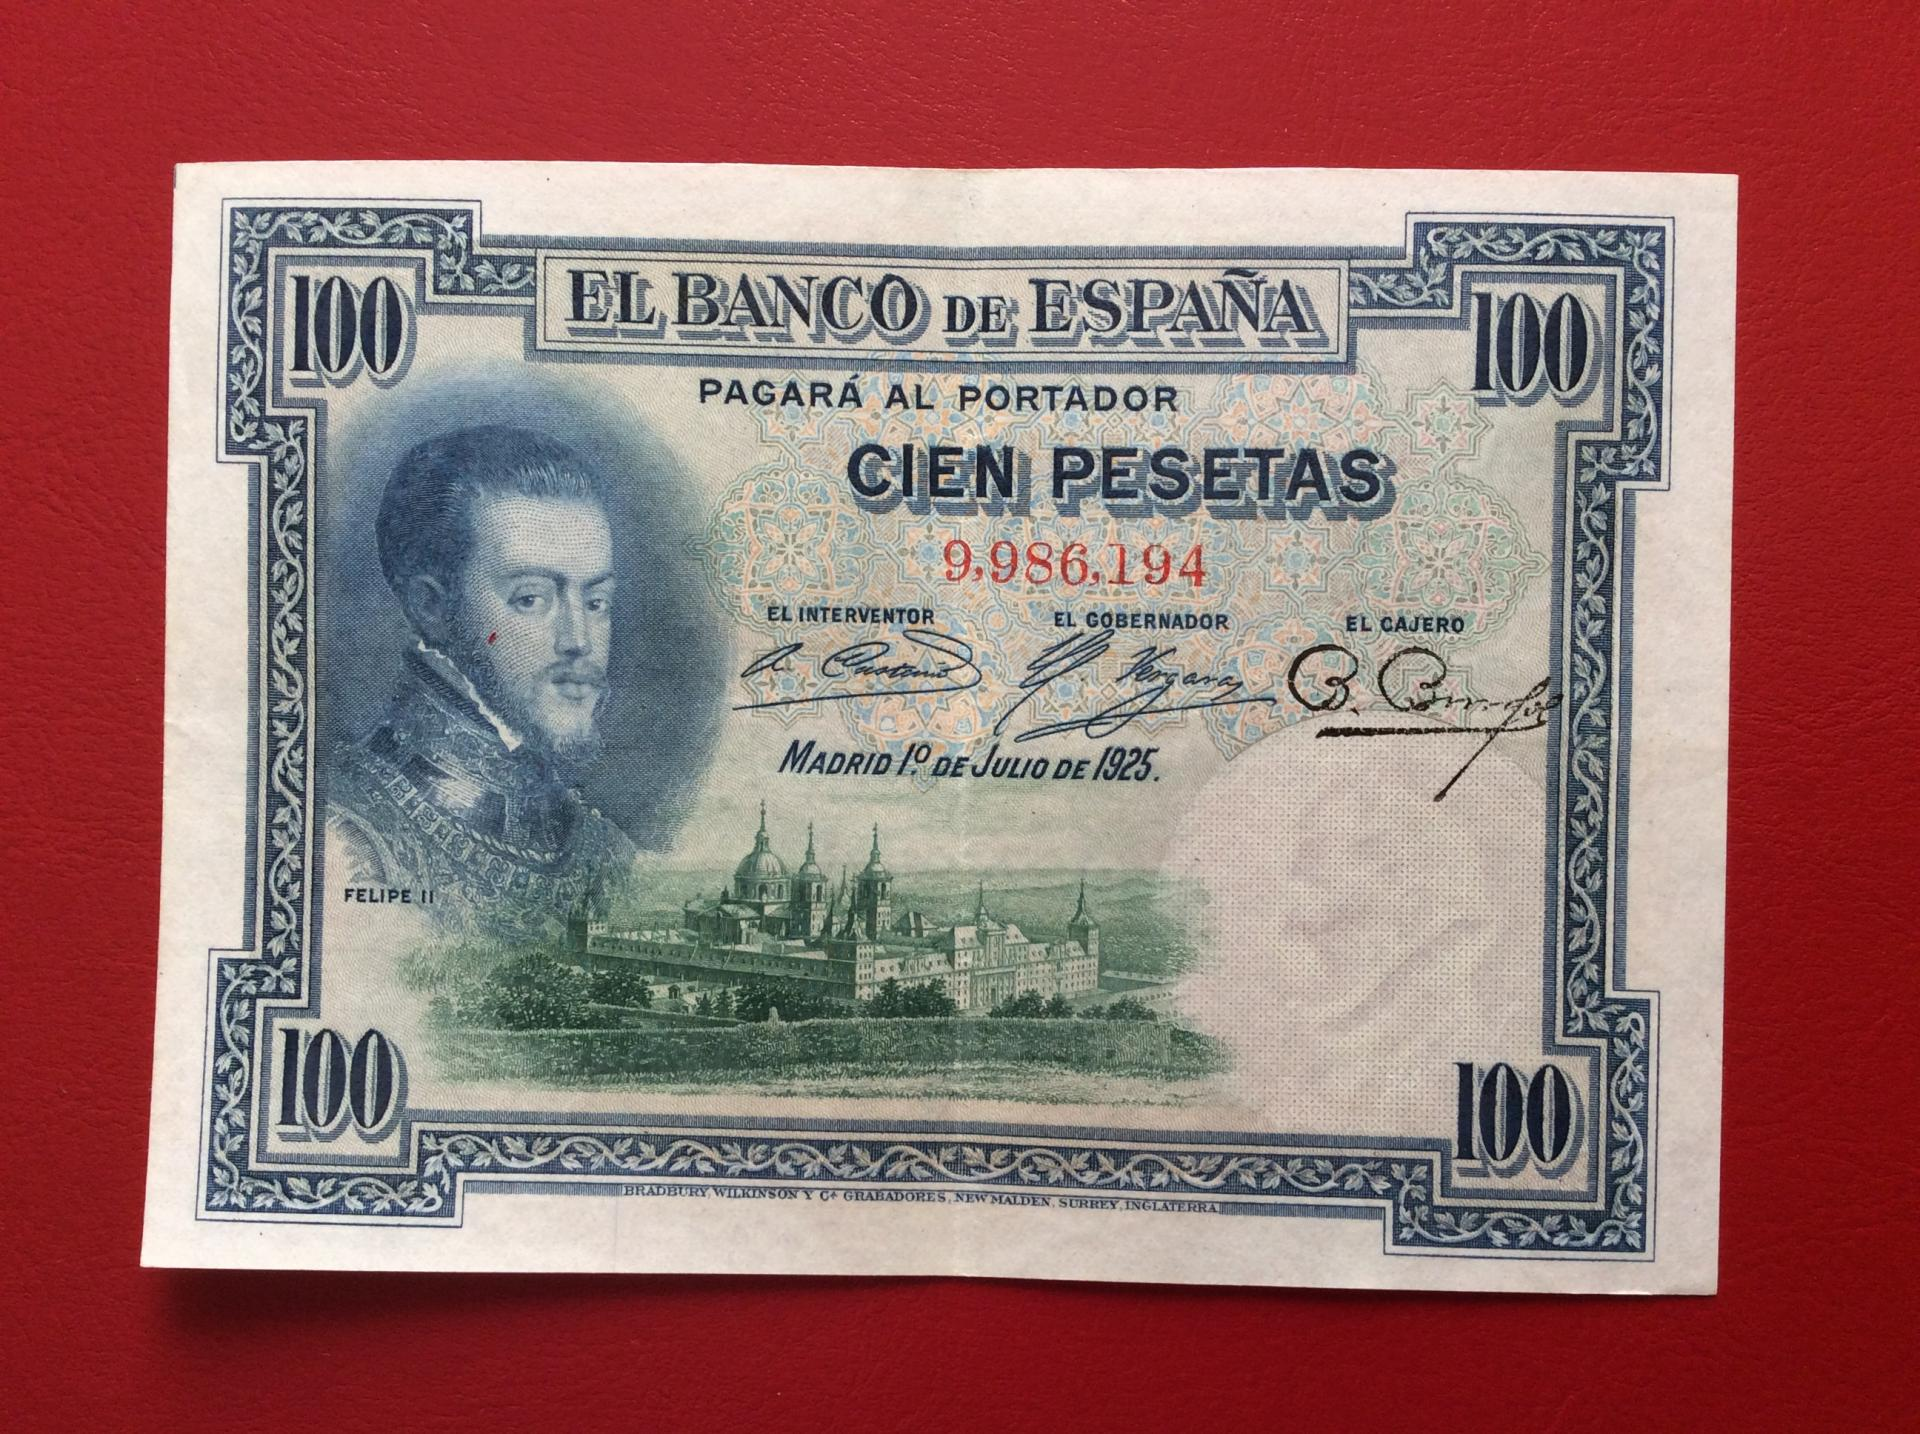 100 PESETAS 1925 - SIN SERIE - FELIPE II - EXCELENTE CONSERVACIÓN - MUY ESCASO ASÍ